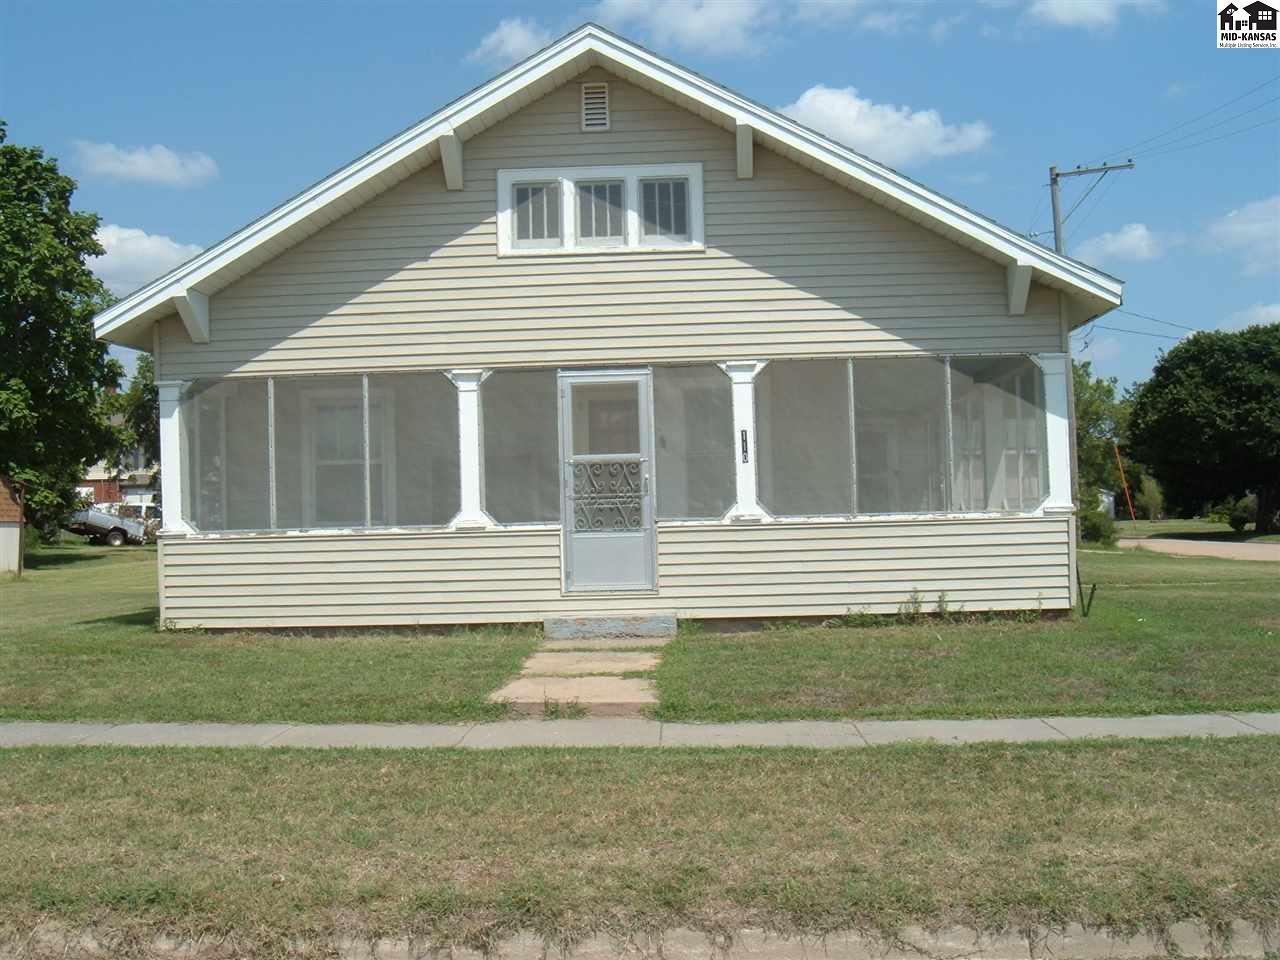 110 S Burns Ave, Turon, KS 67583